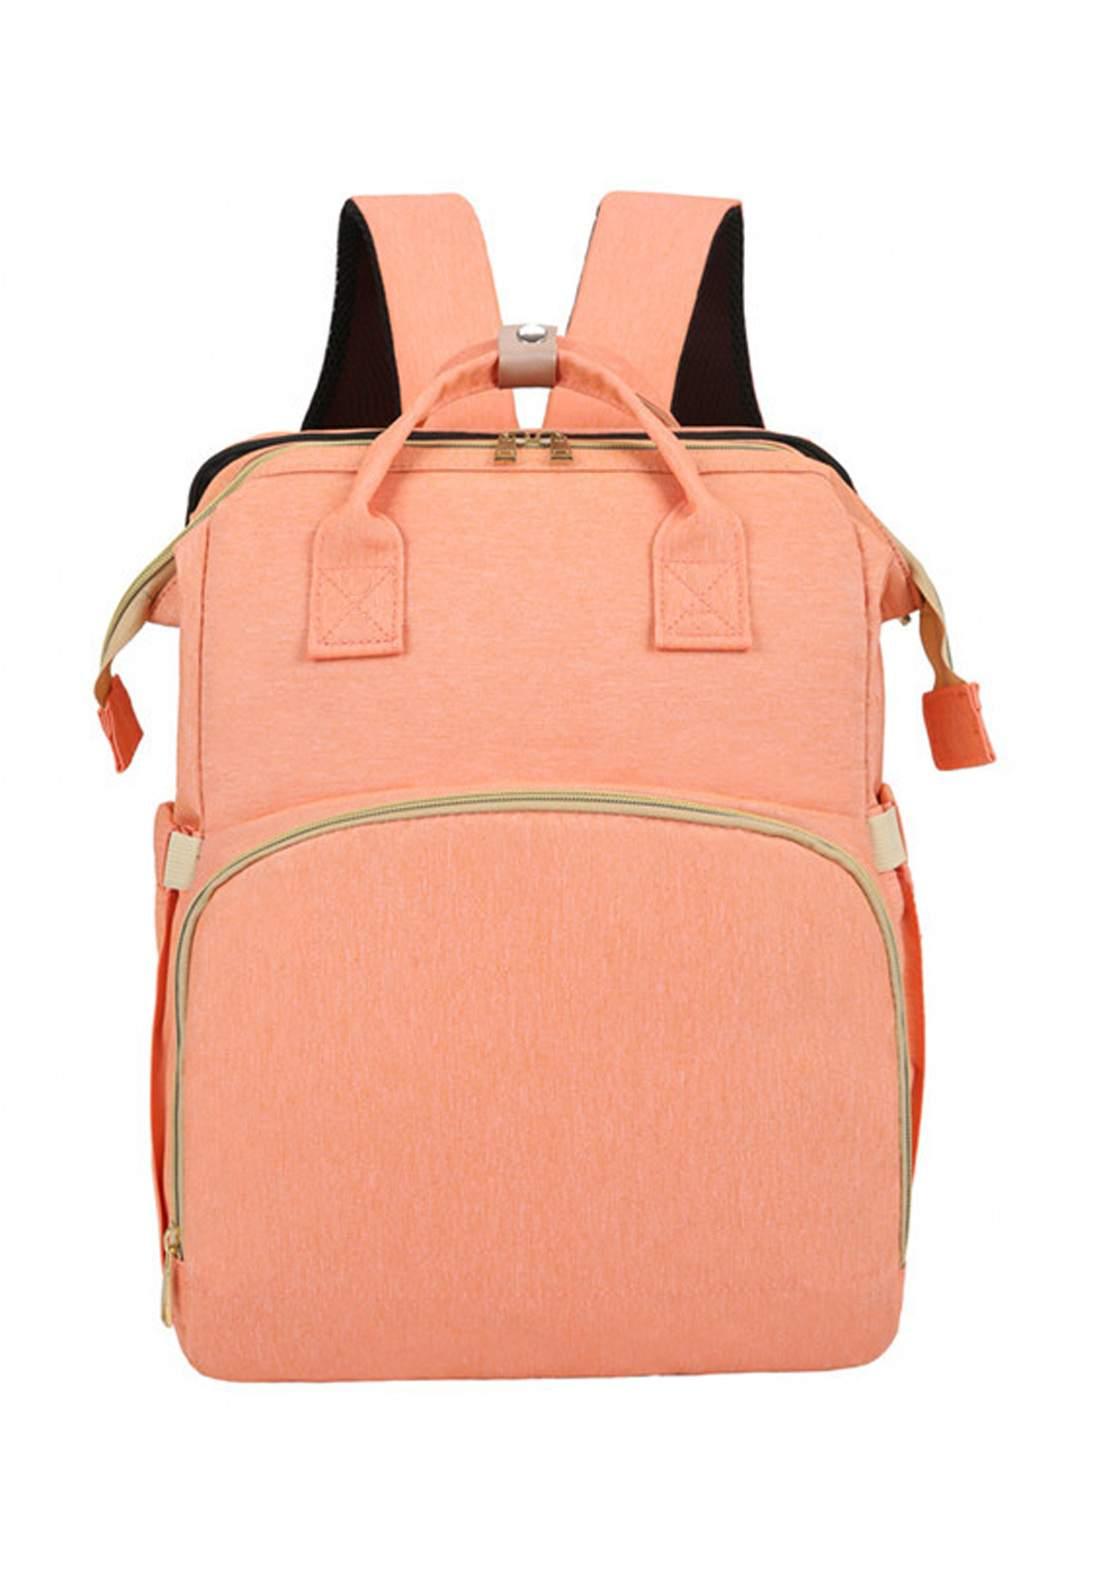 Large Backpack Baby  حقيبة ظهر لمستلزمات الاطفال